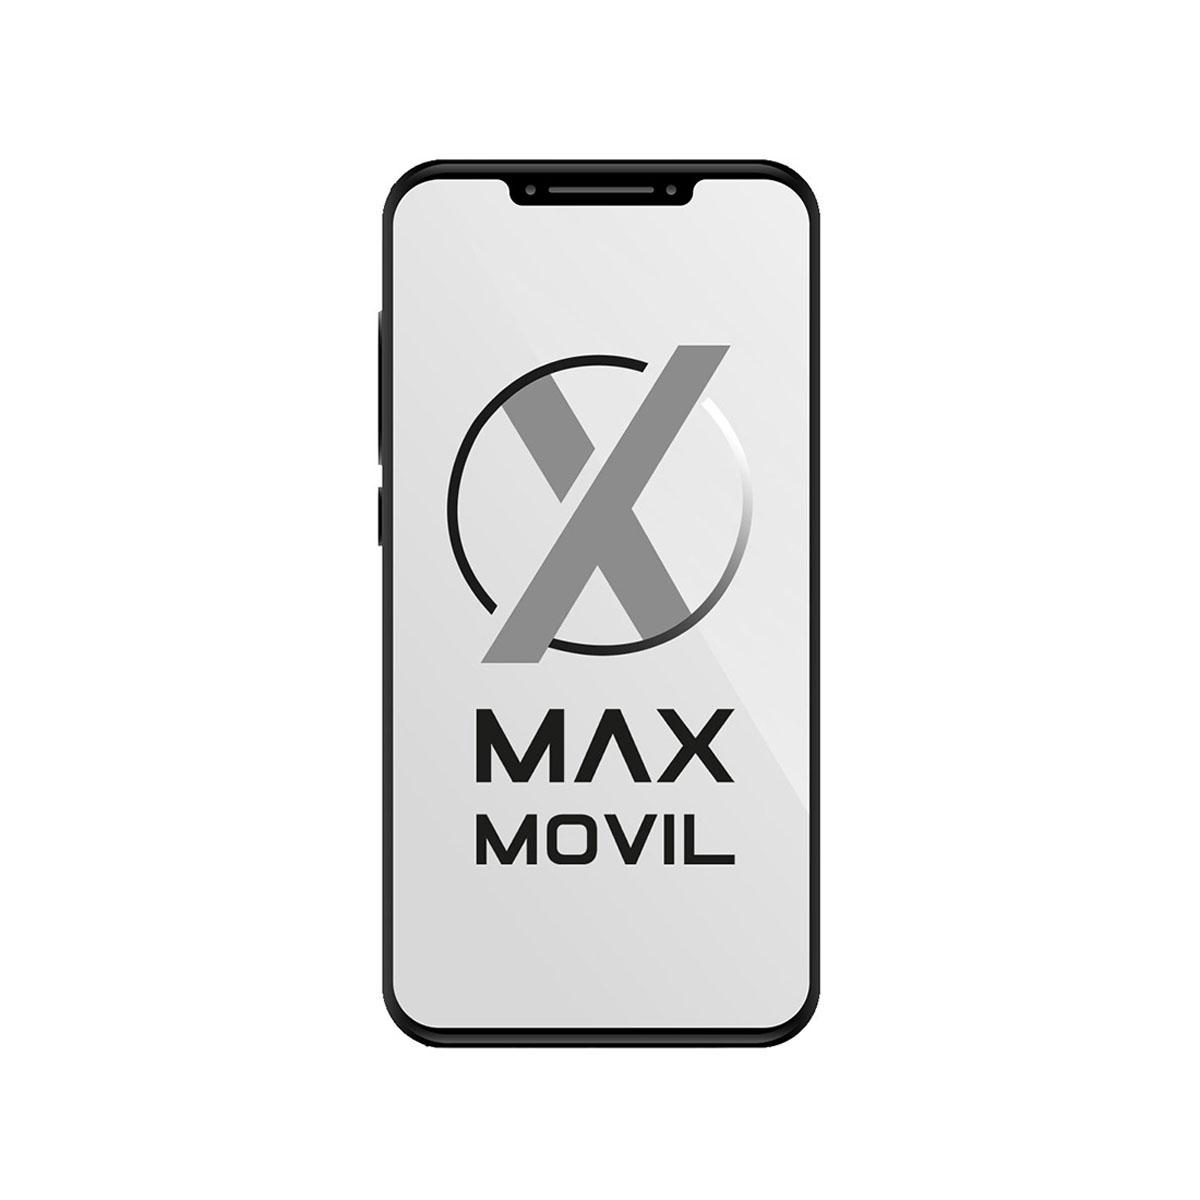 Telefono movil Sony Xperia T3 D5103 4G libre morado ECORECICLADO CLASE A